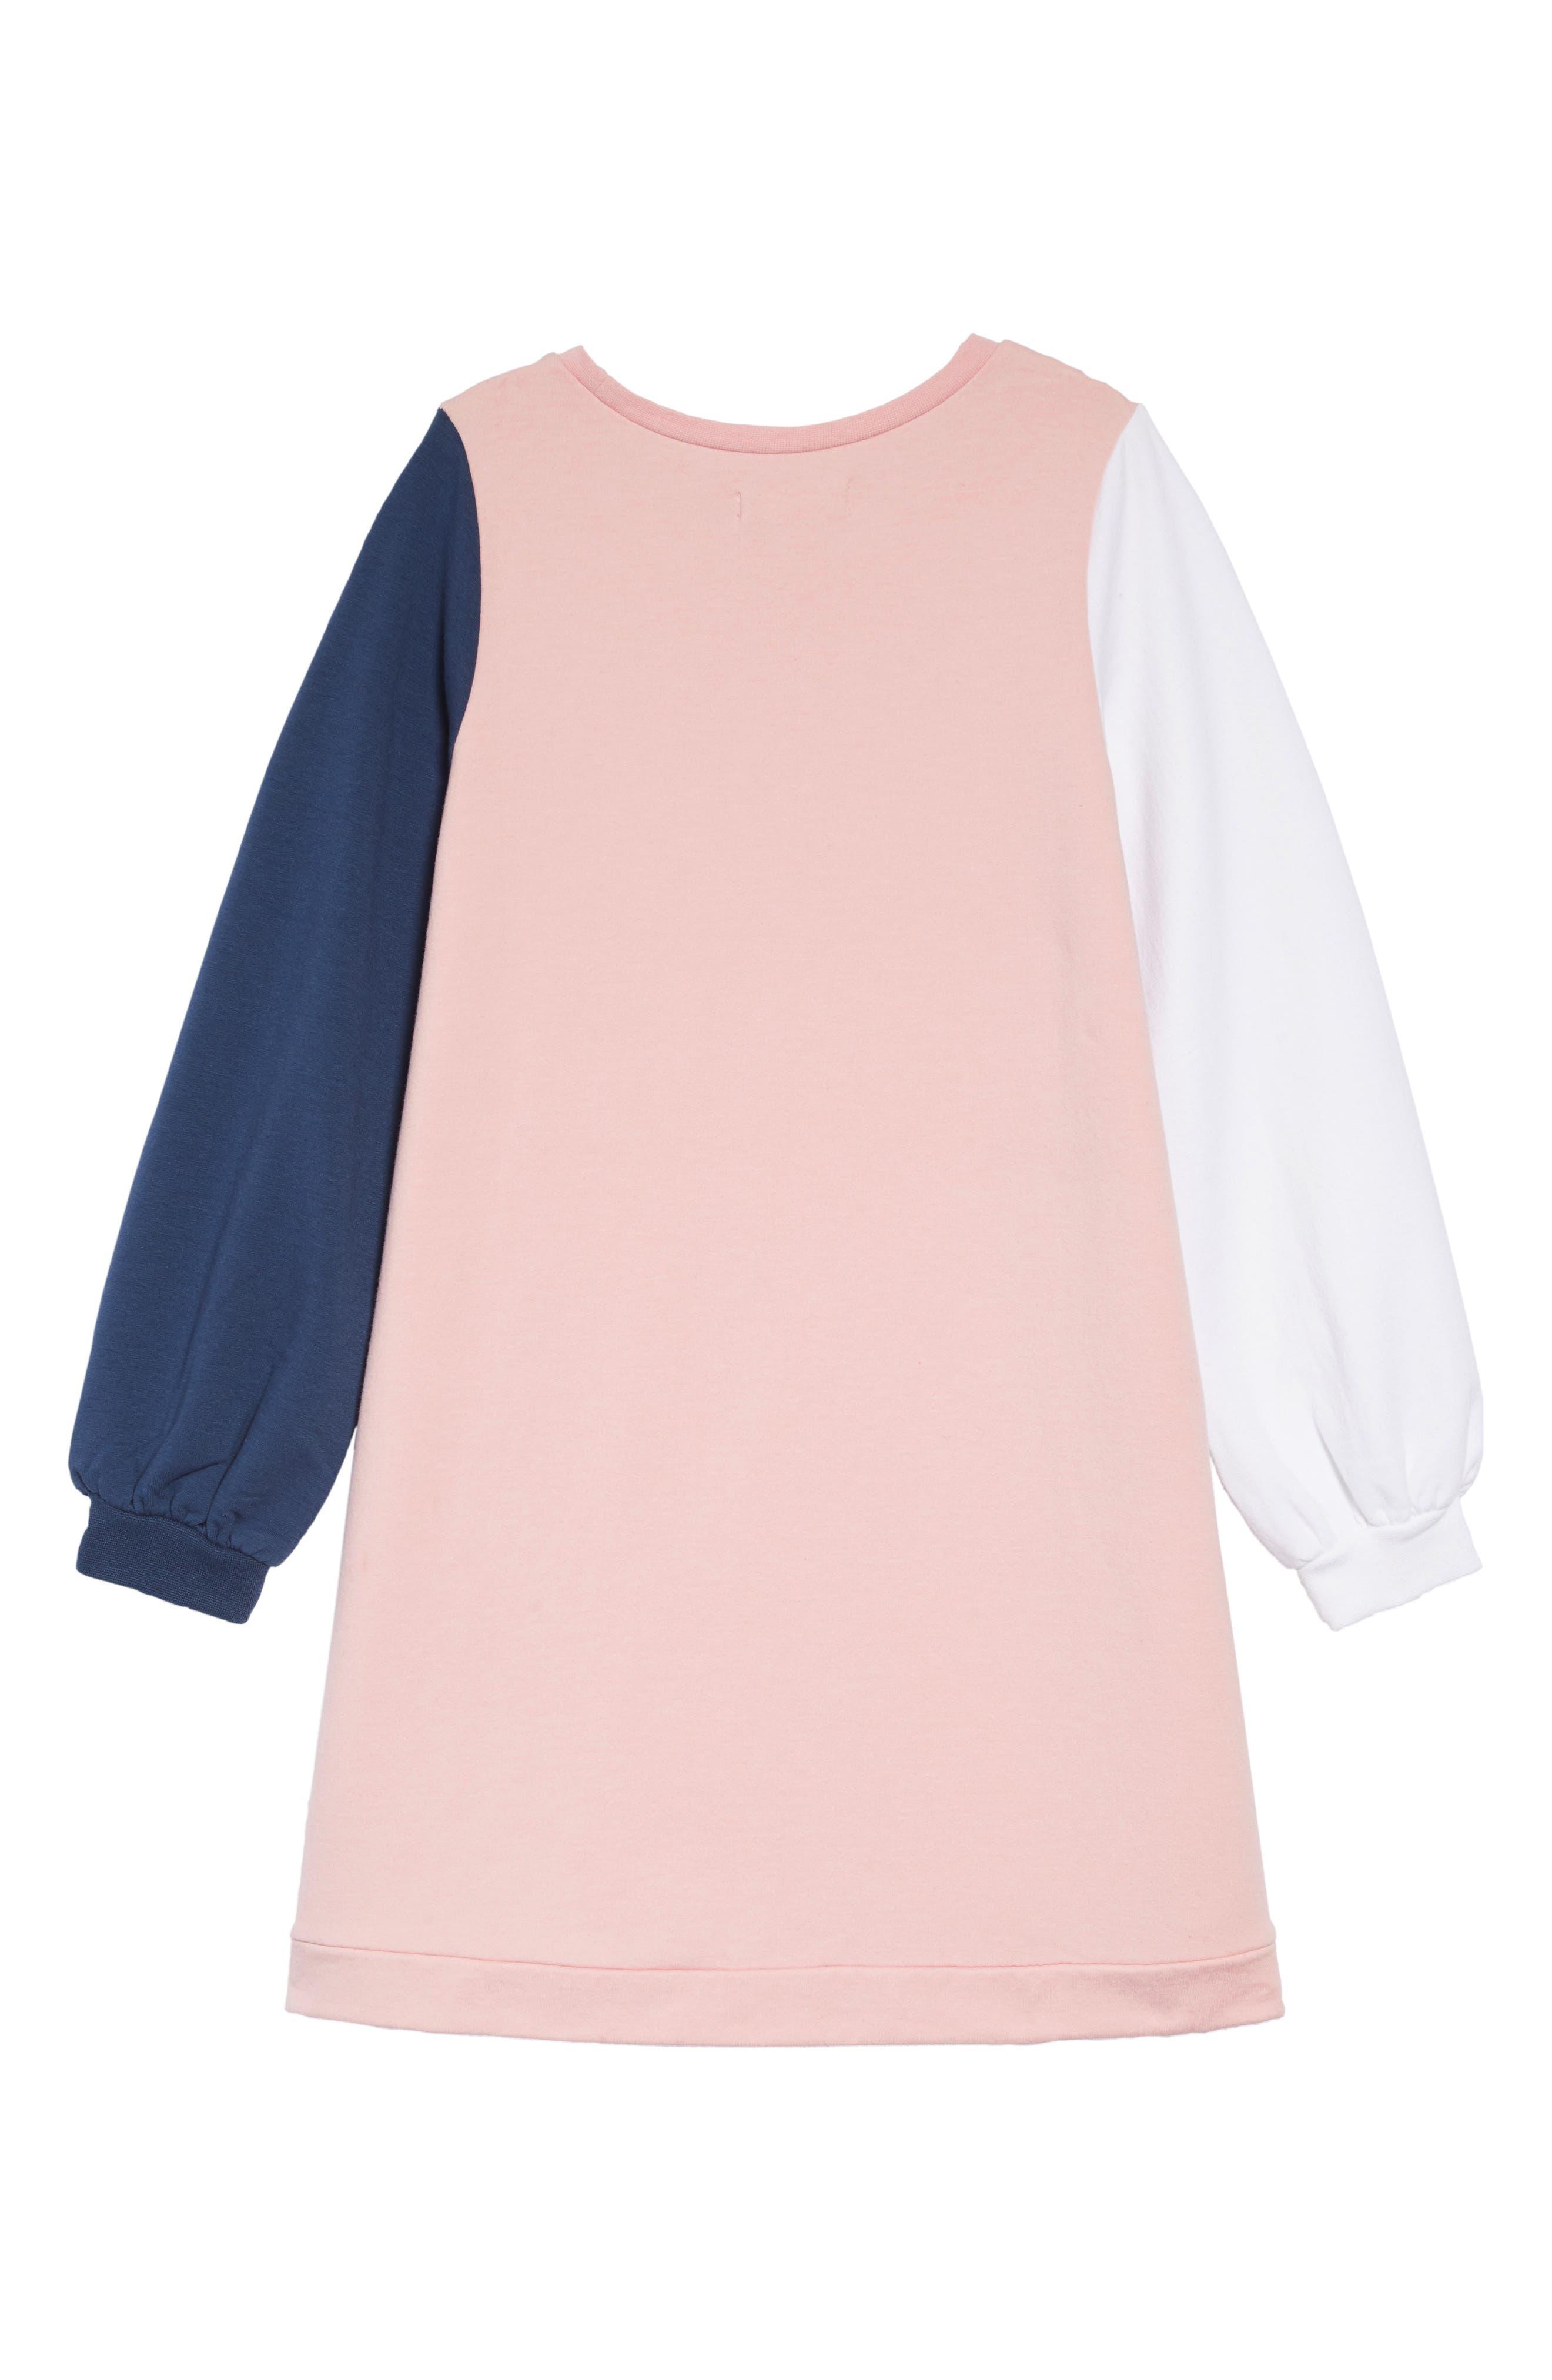 TUCKER + TATE, Colorblock Fleece Dress, Alternate thumbnail 2, color, 680